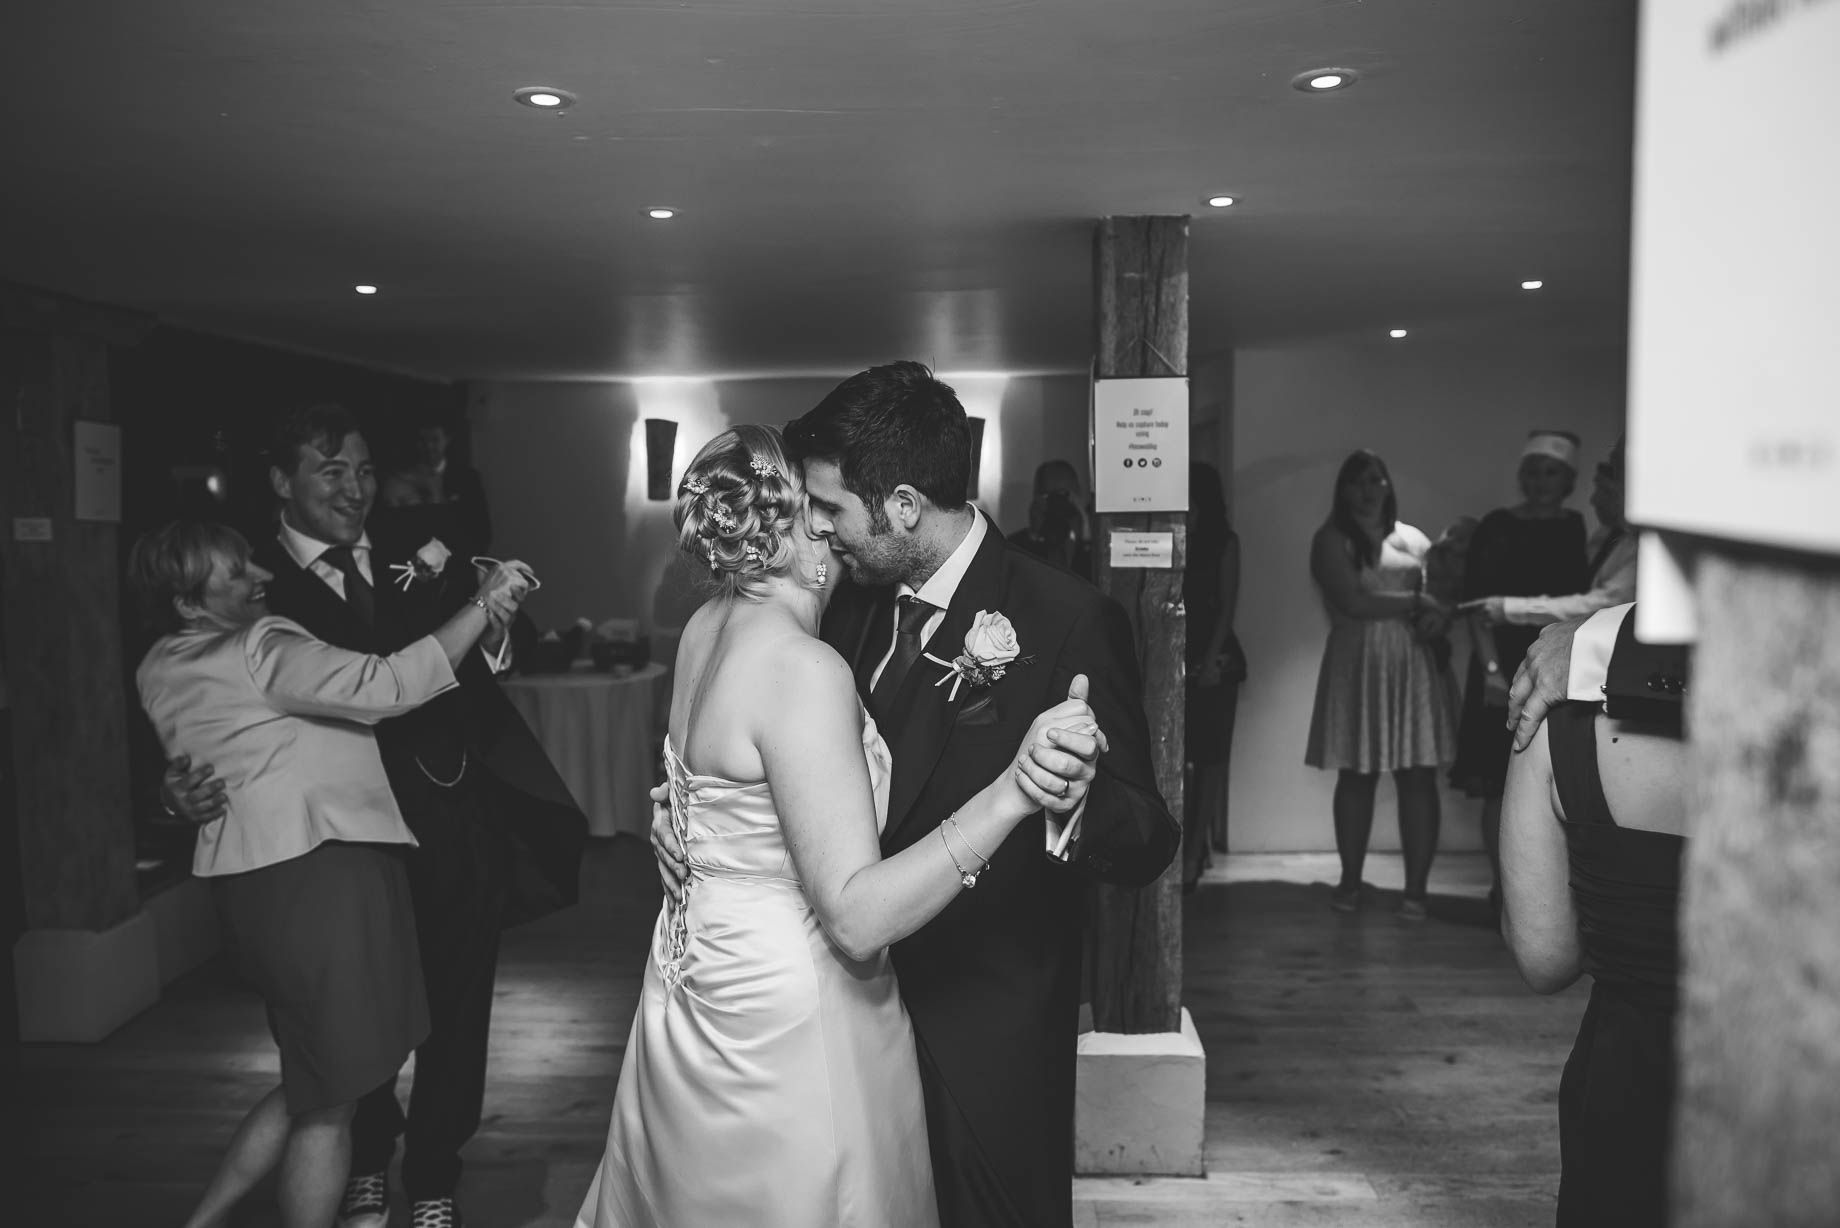 Bury Court Barn wedding photography - Guy Collier - Hannah and Mark (170 of 191)